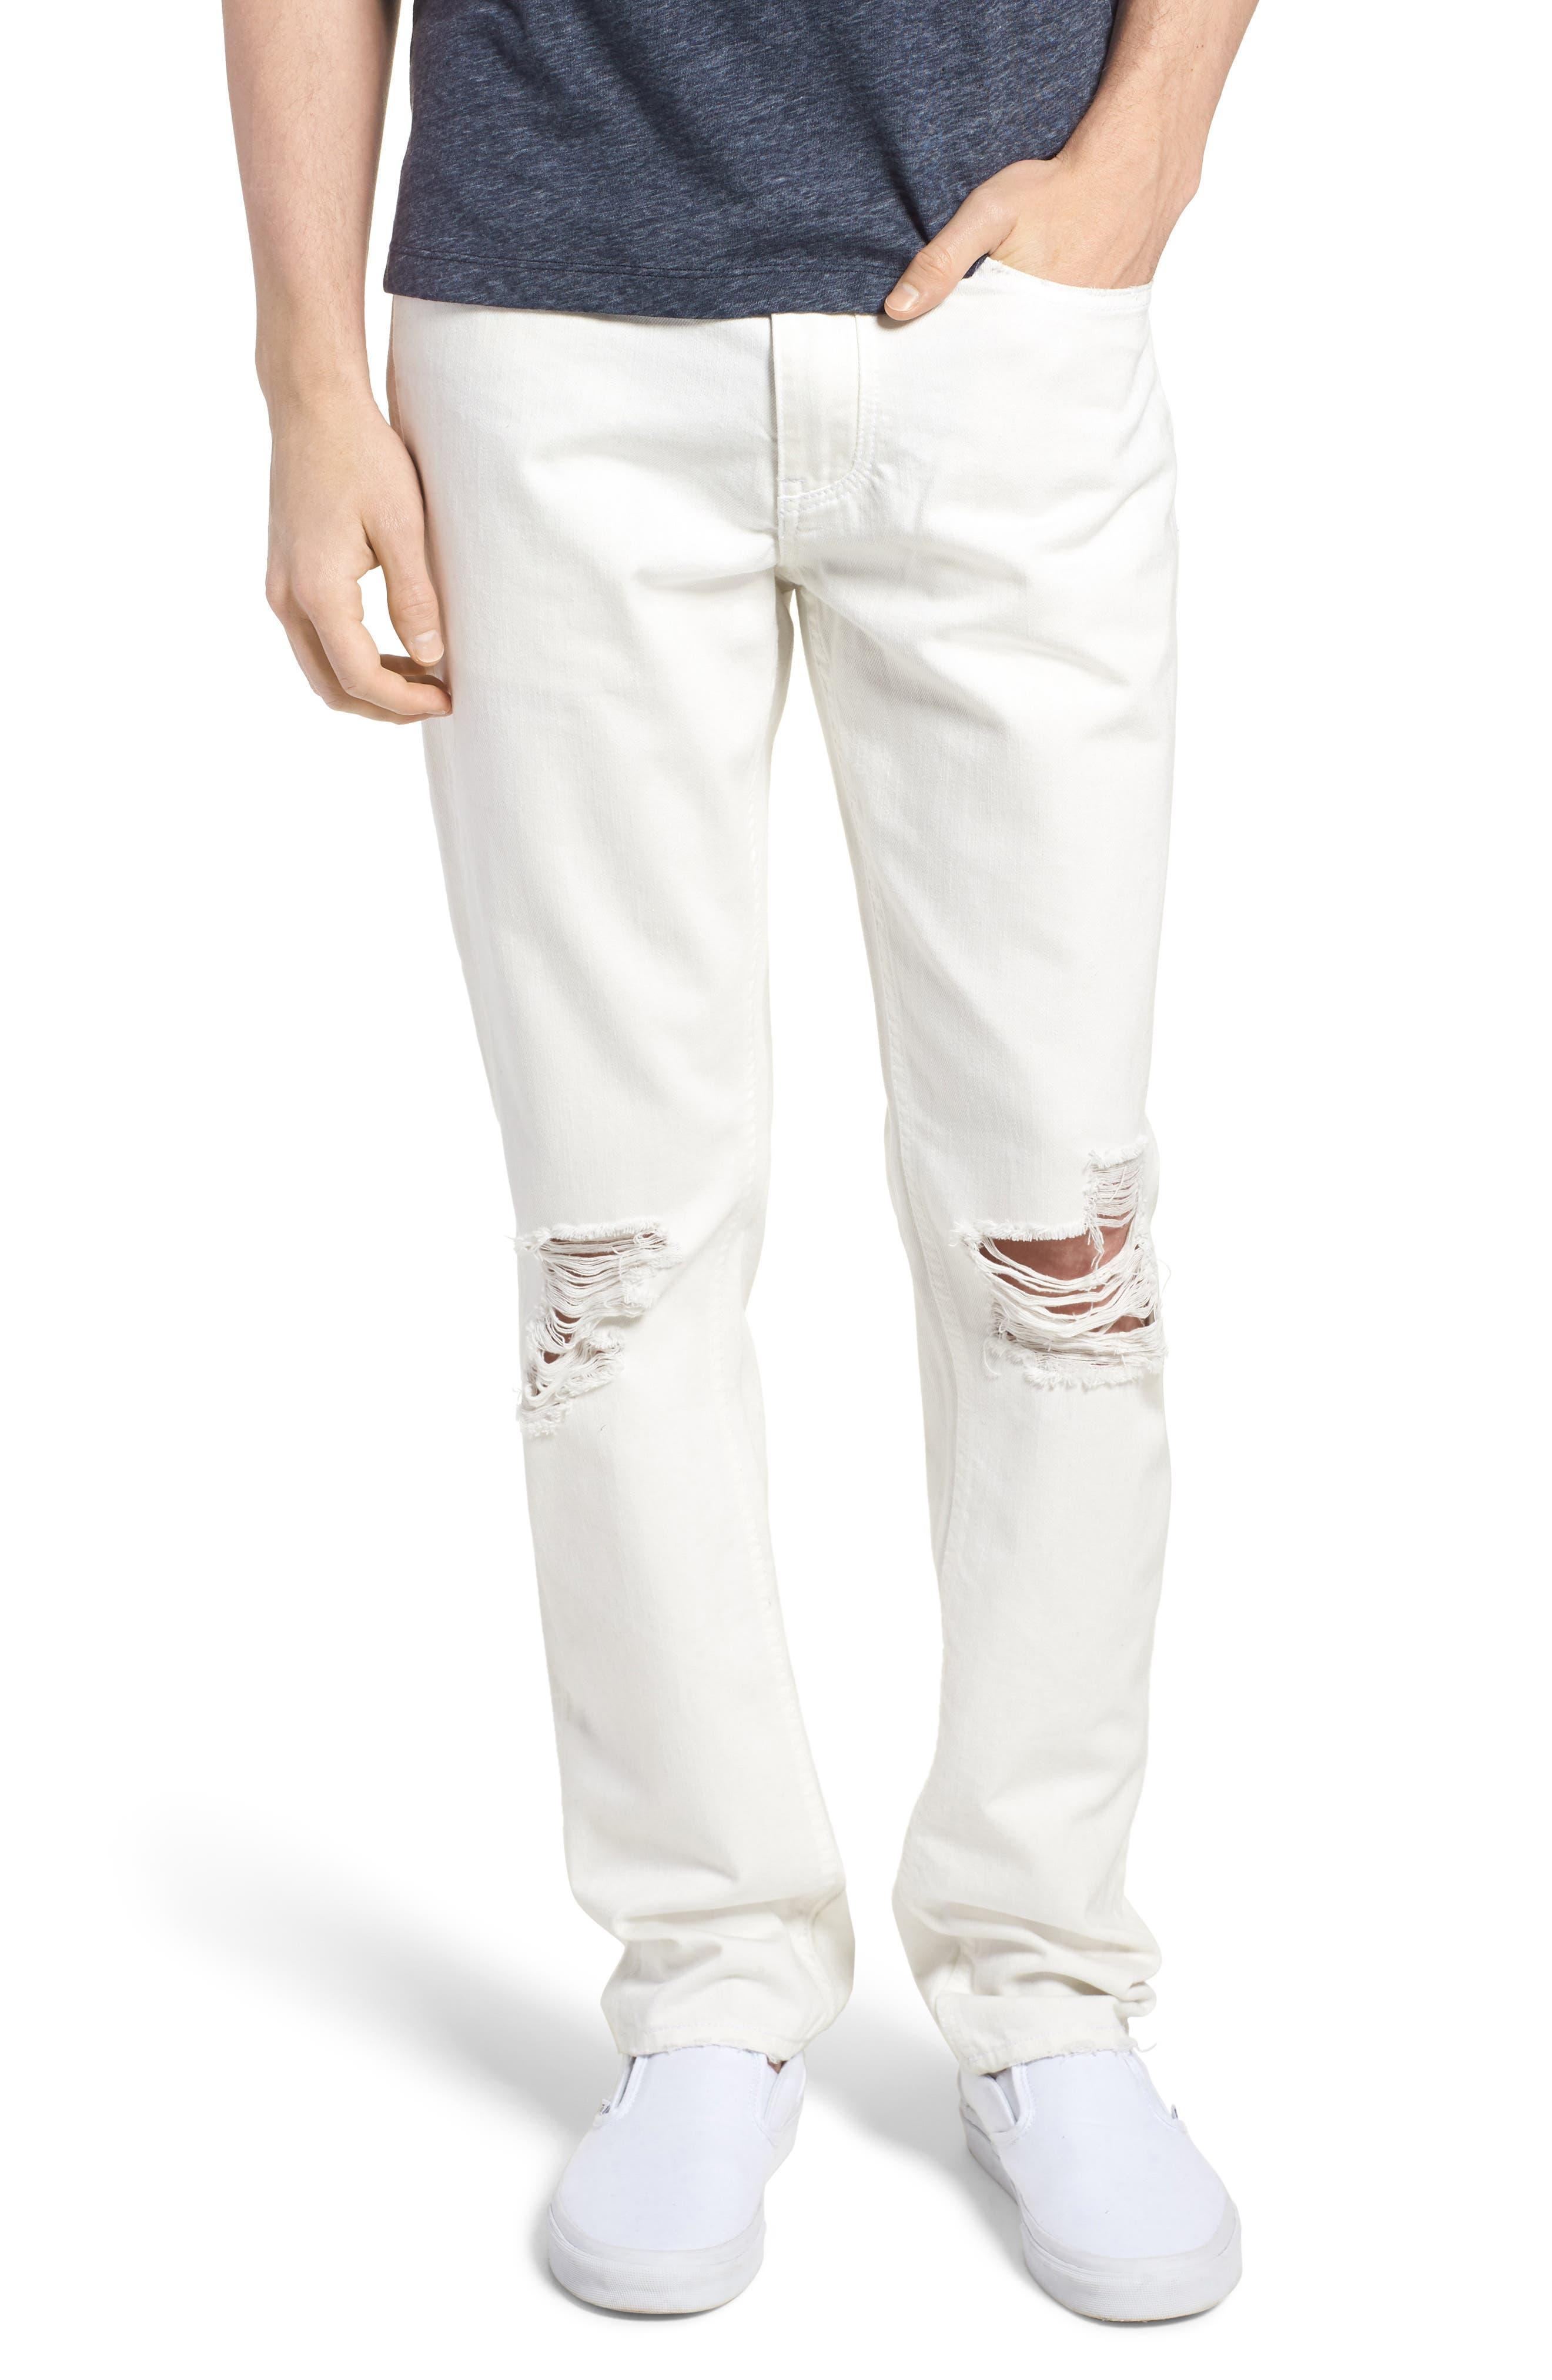 BLANKNYC Wooster Slim Fit Jeans (Particular Set of Skills)